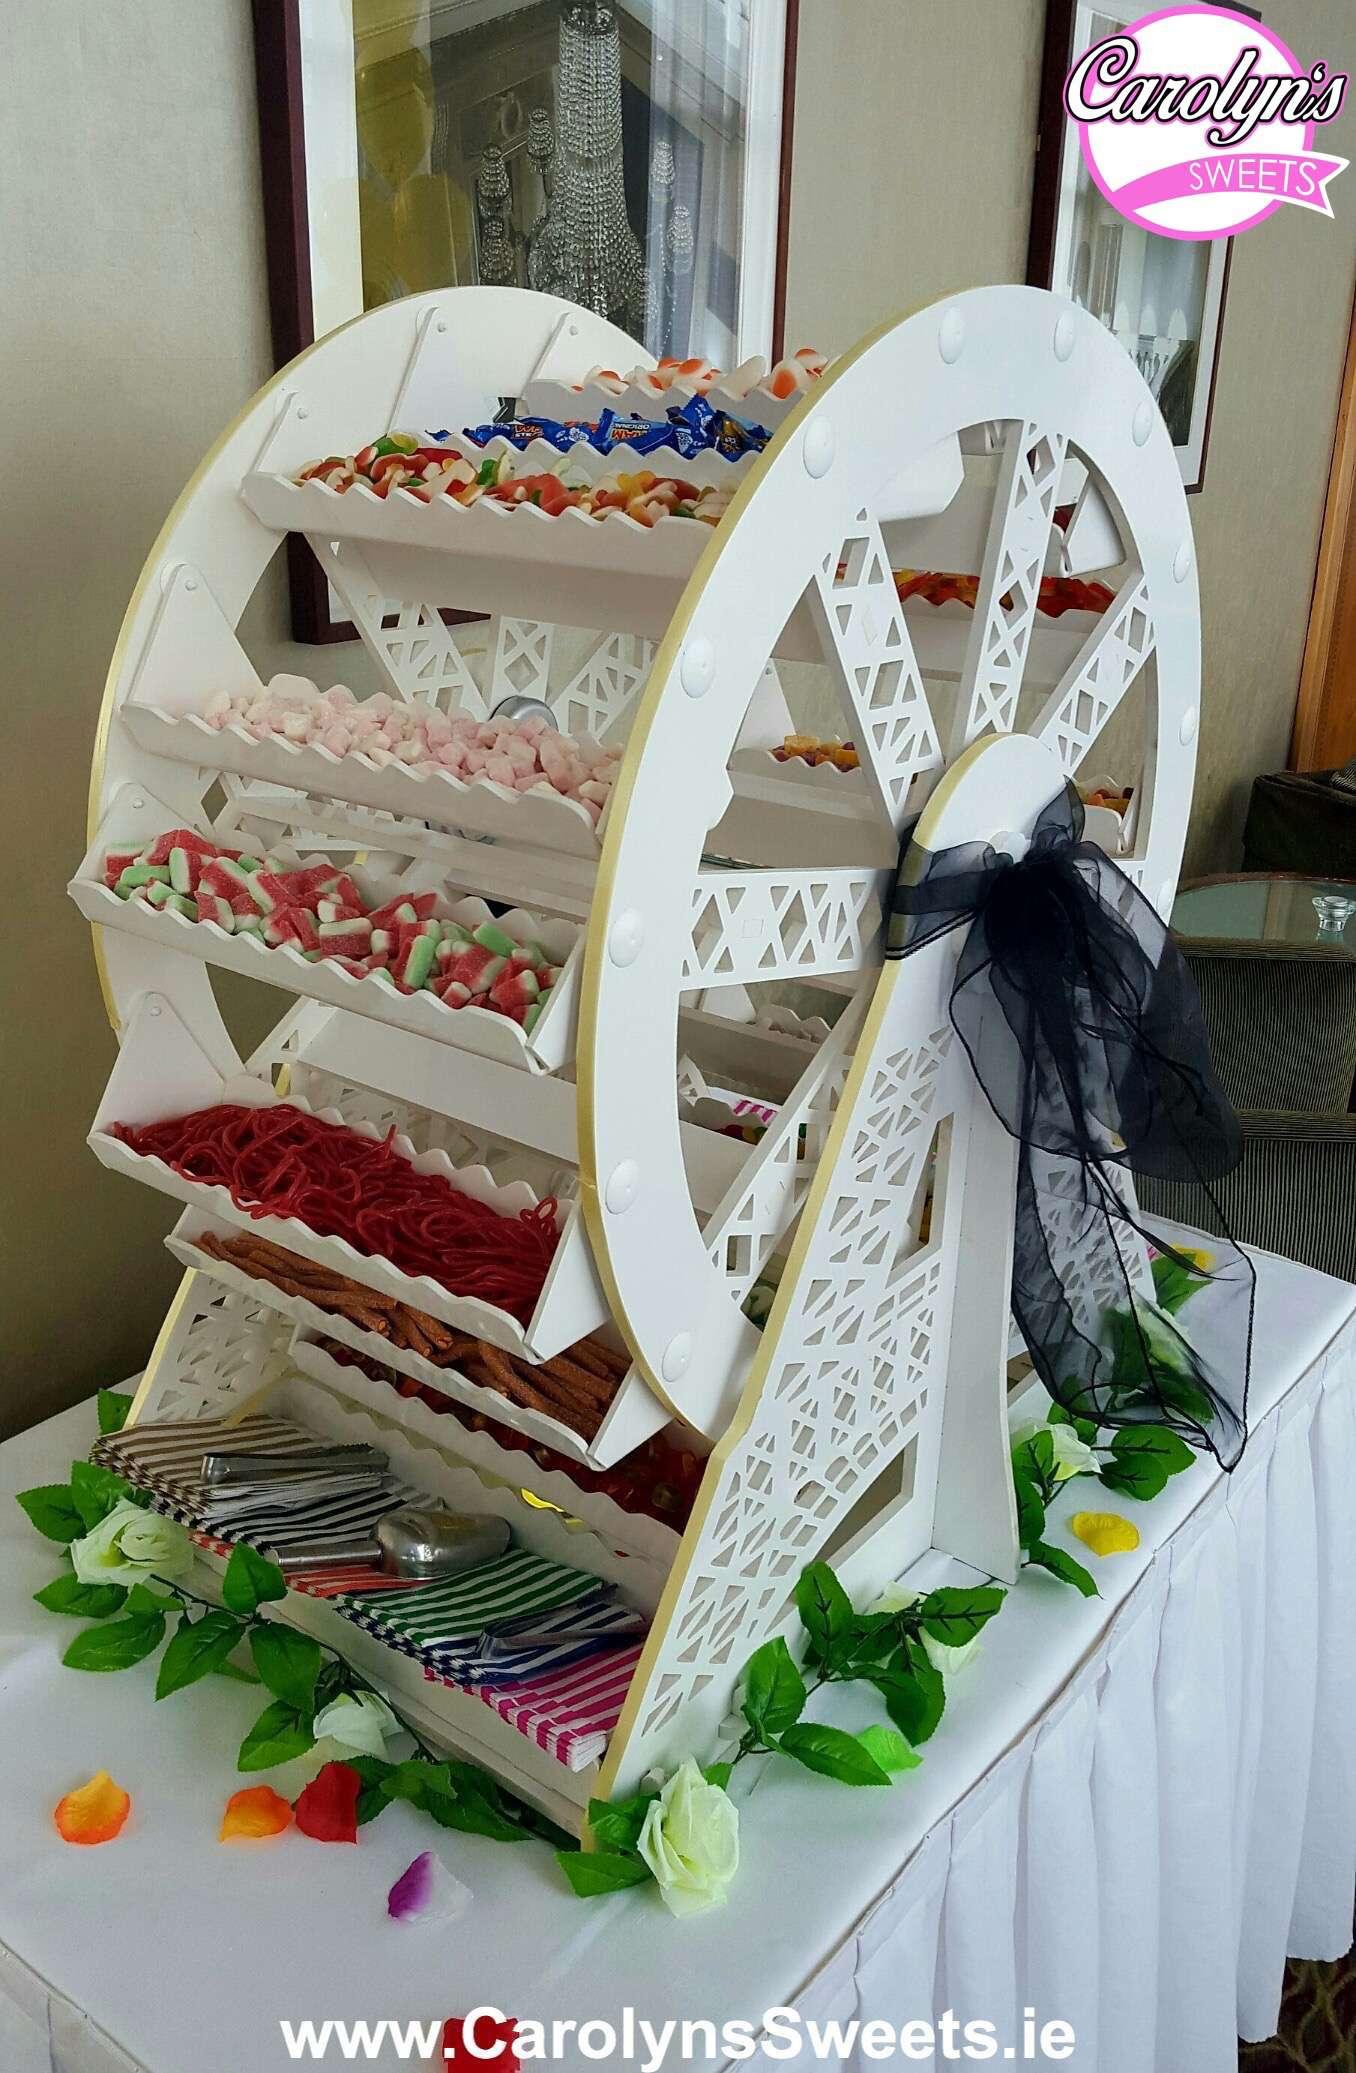 Candy Ferris Wheel Hire0 2